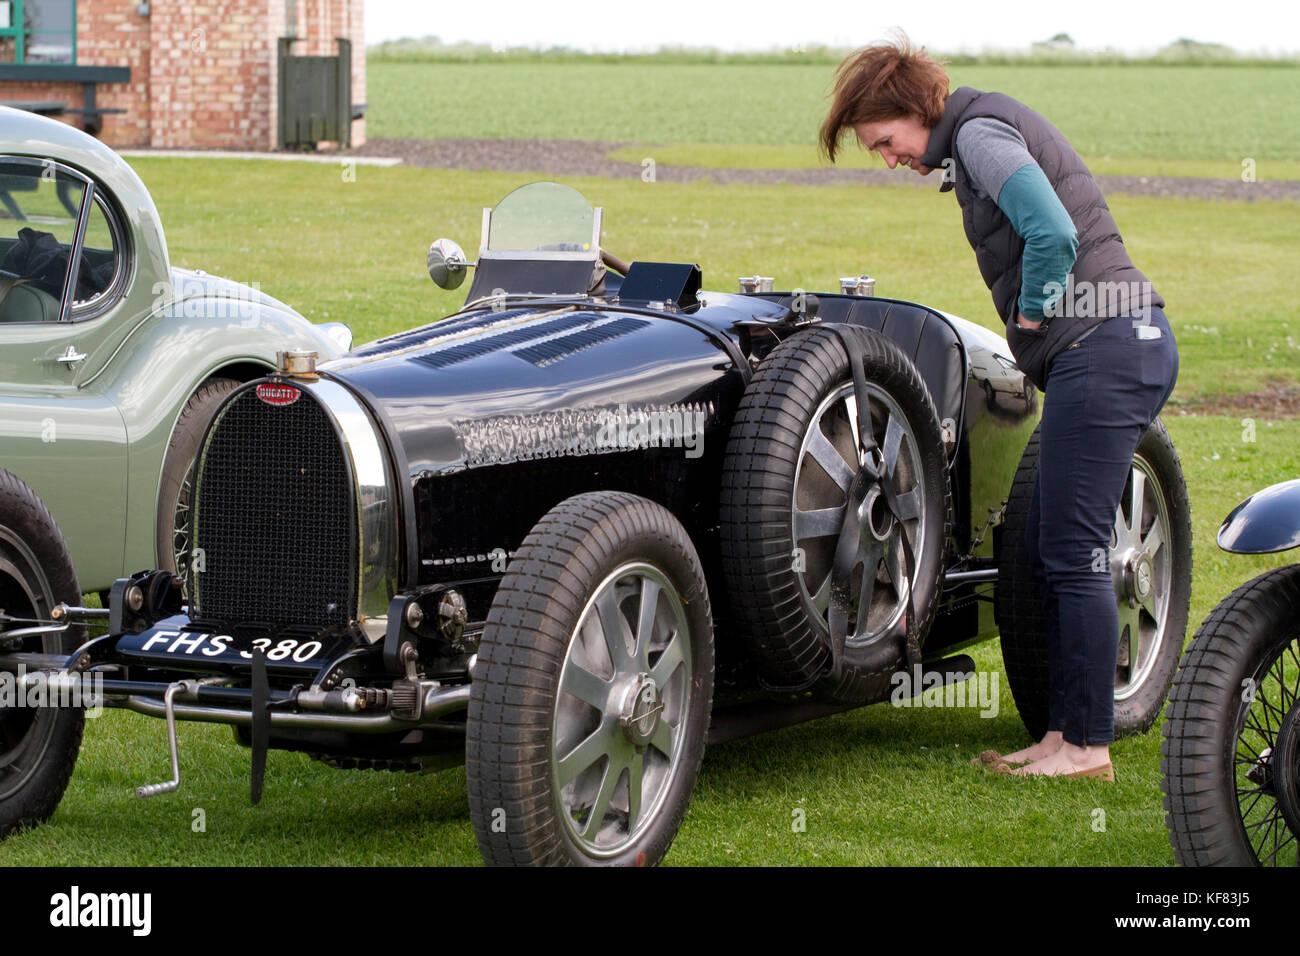 Woman inspecting a classic soft top Bugatti - Stock Image